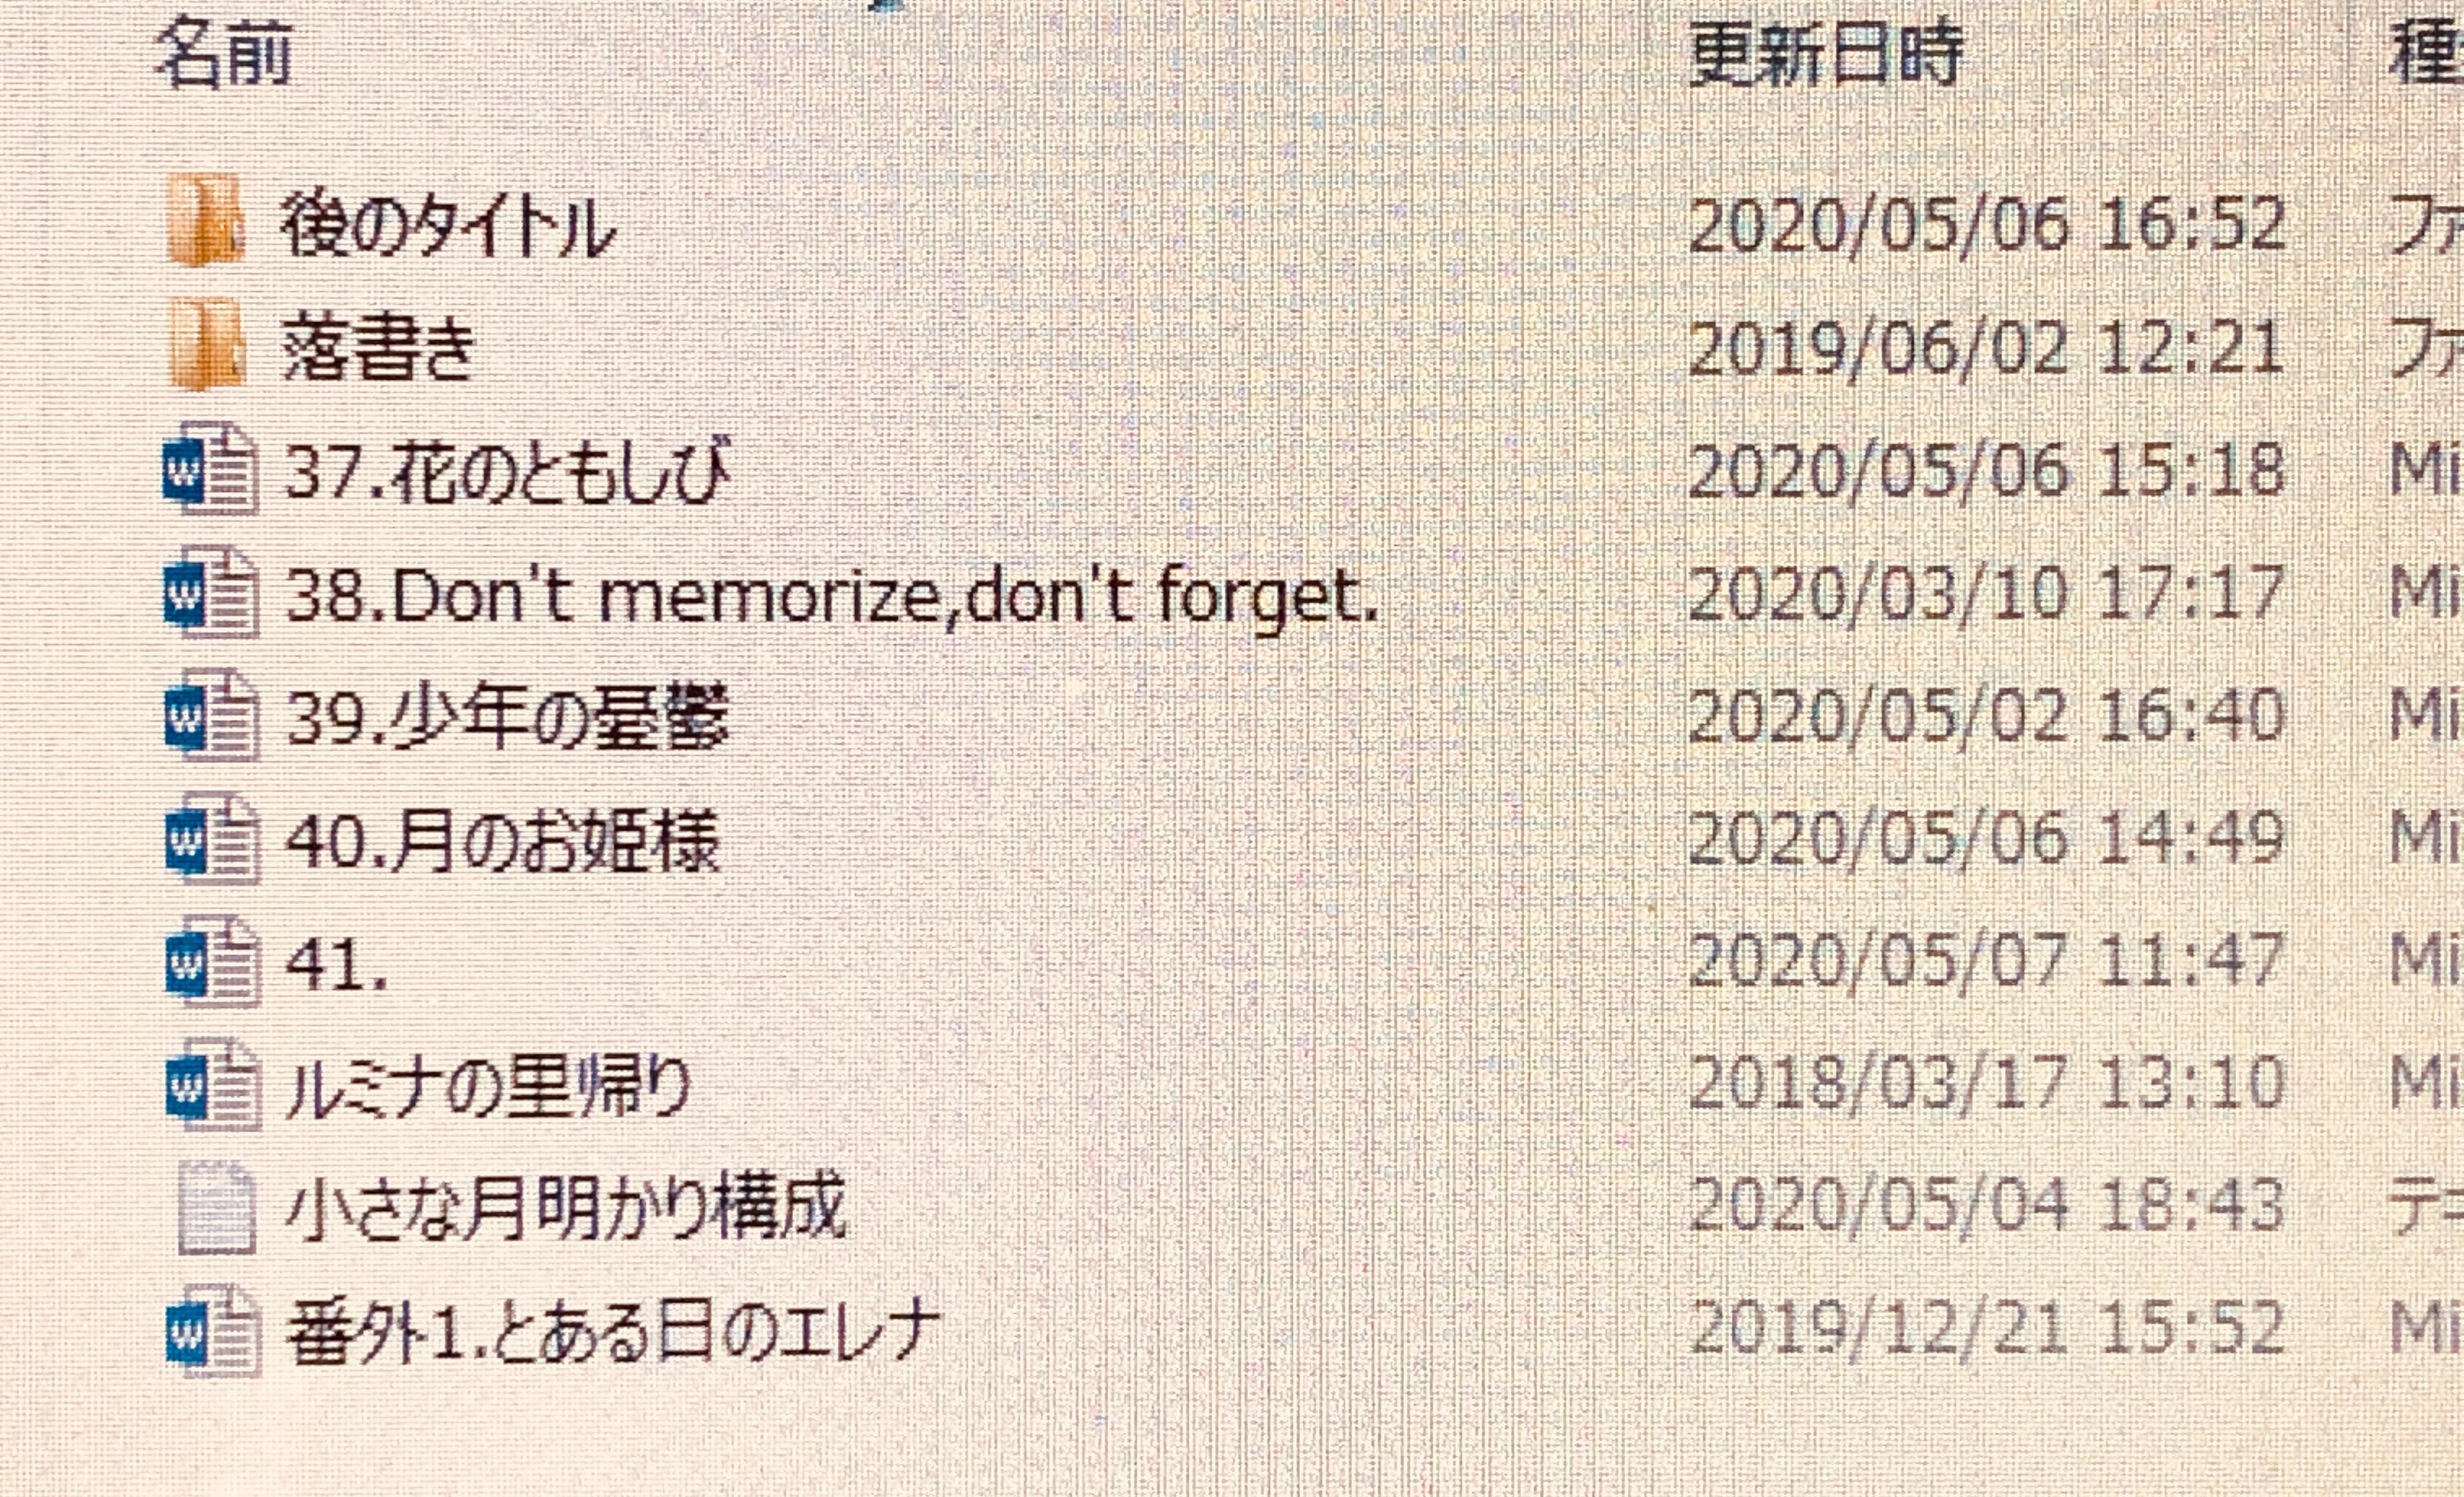 f:id:Yuki-19:20200514140106j:image